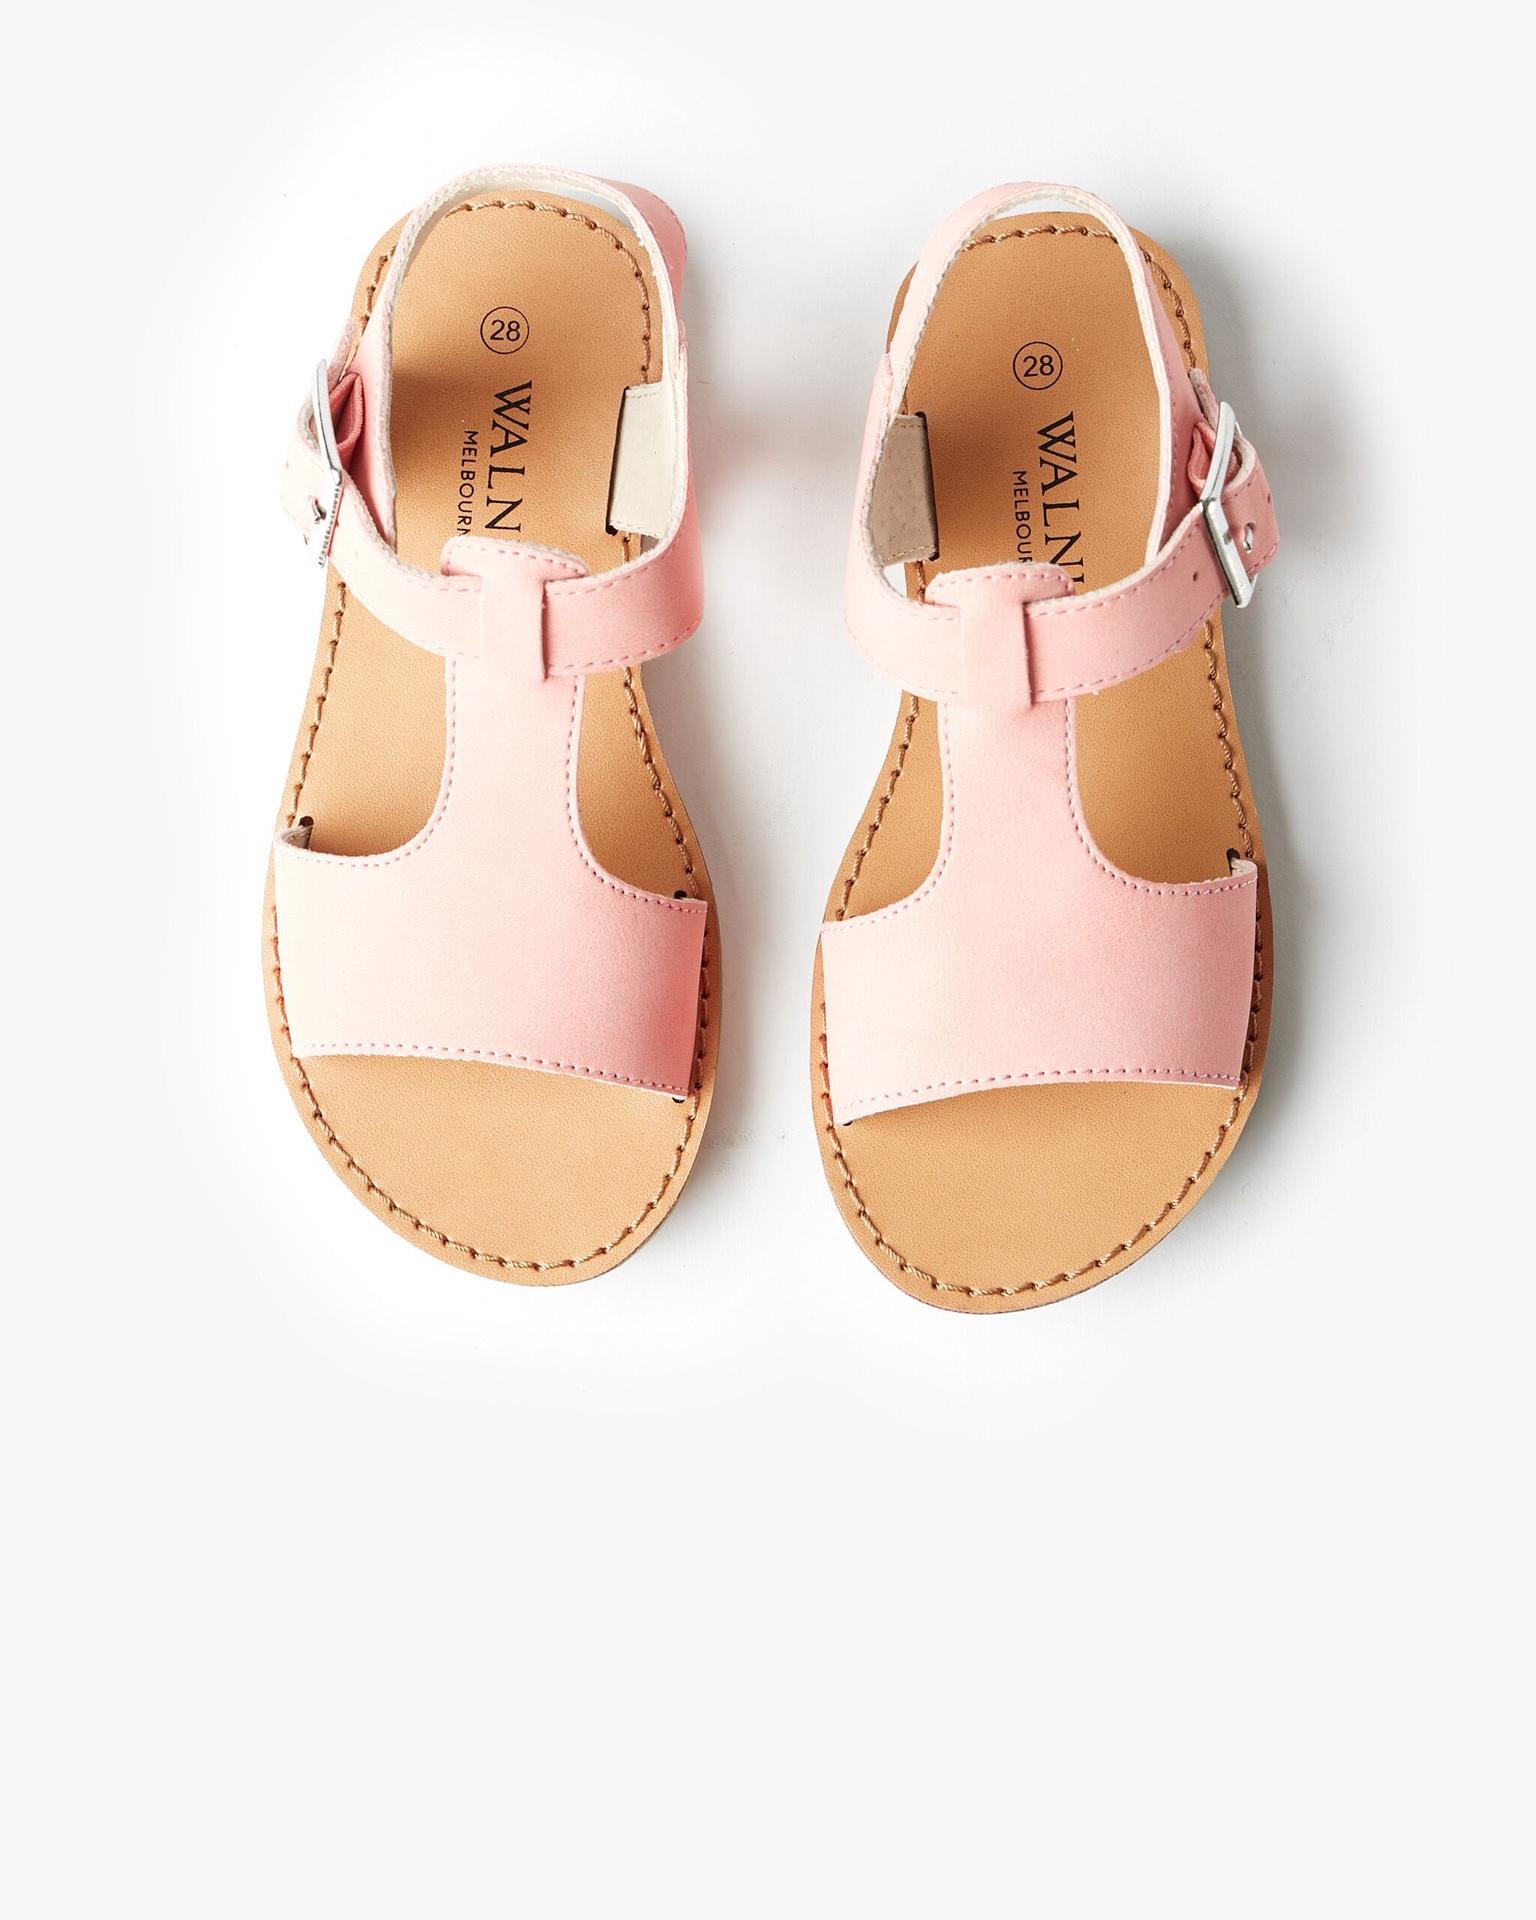 Walnut Racer Sandal Lolly Pink